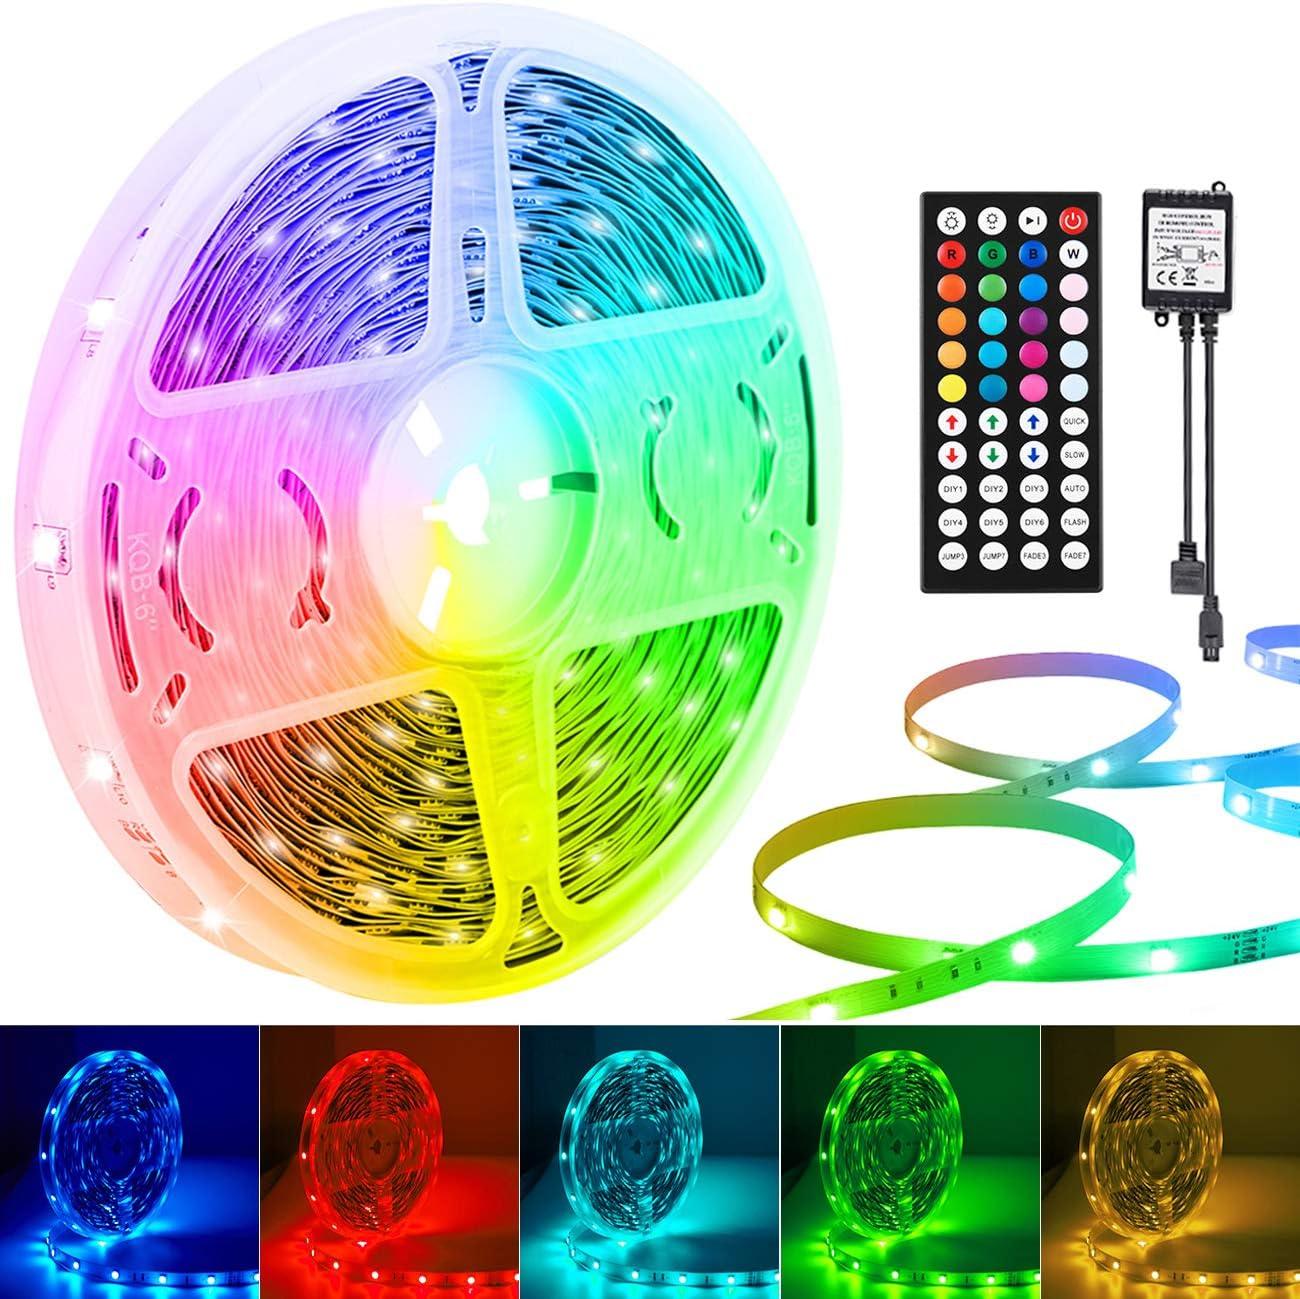 LED Ranking TOP8 Strip Lights 50ft 15m 5050 Product RGB Strips IR with 44 R Keys